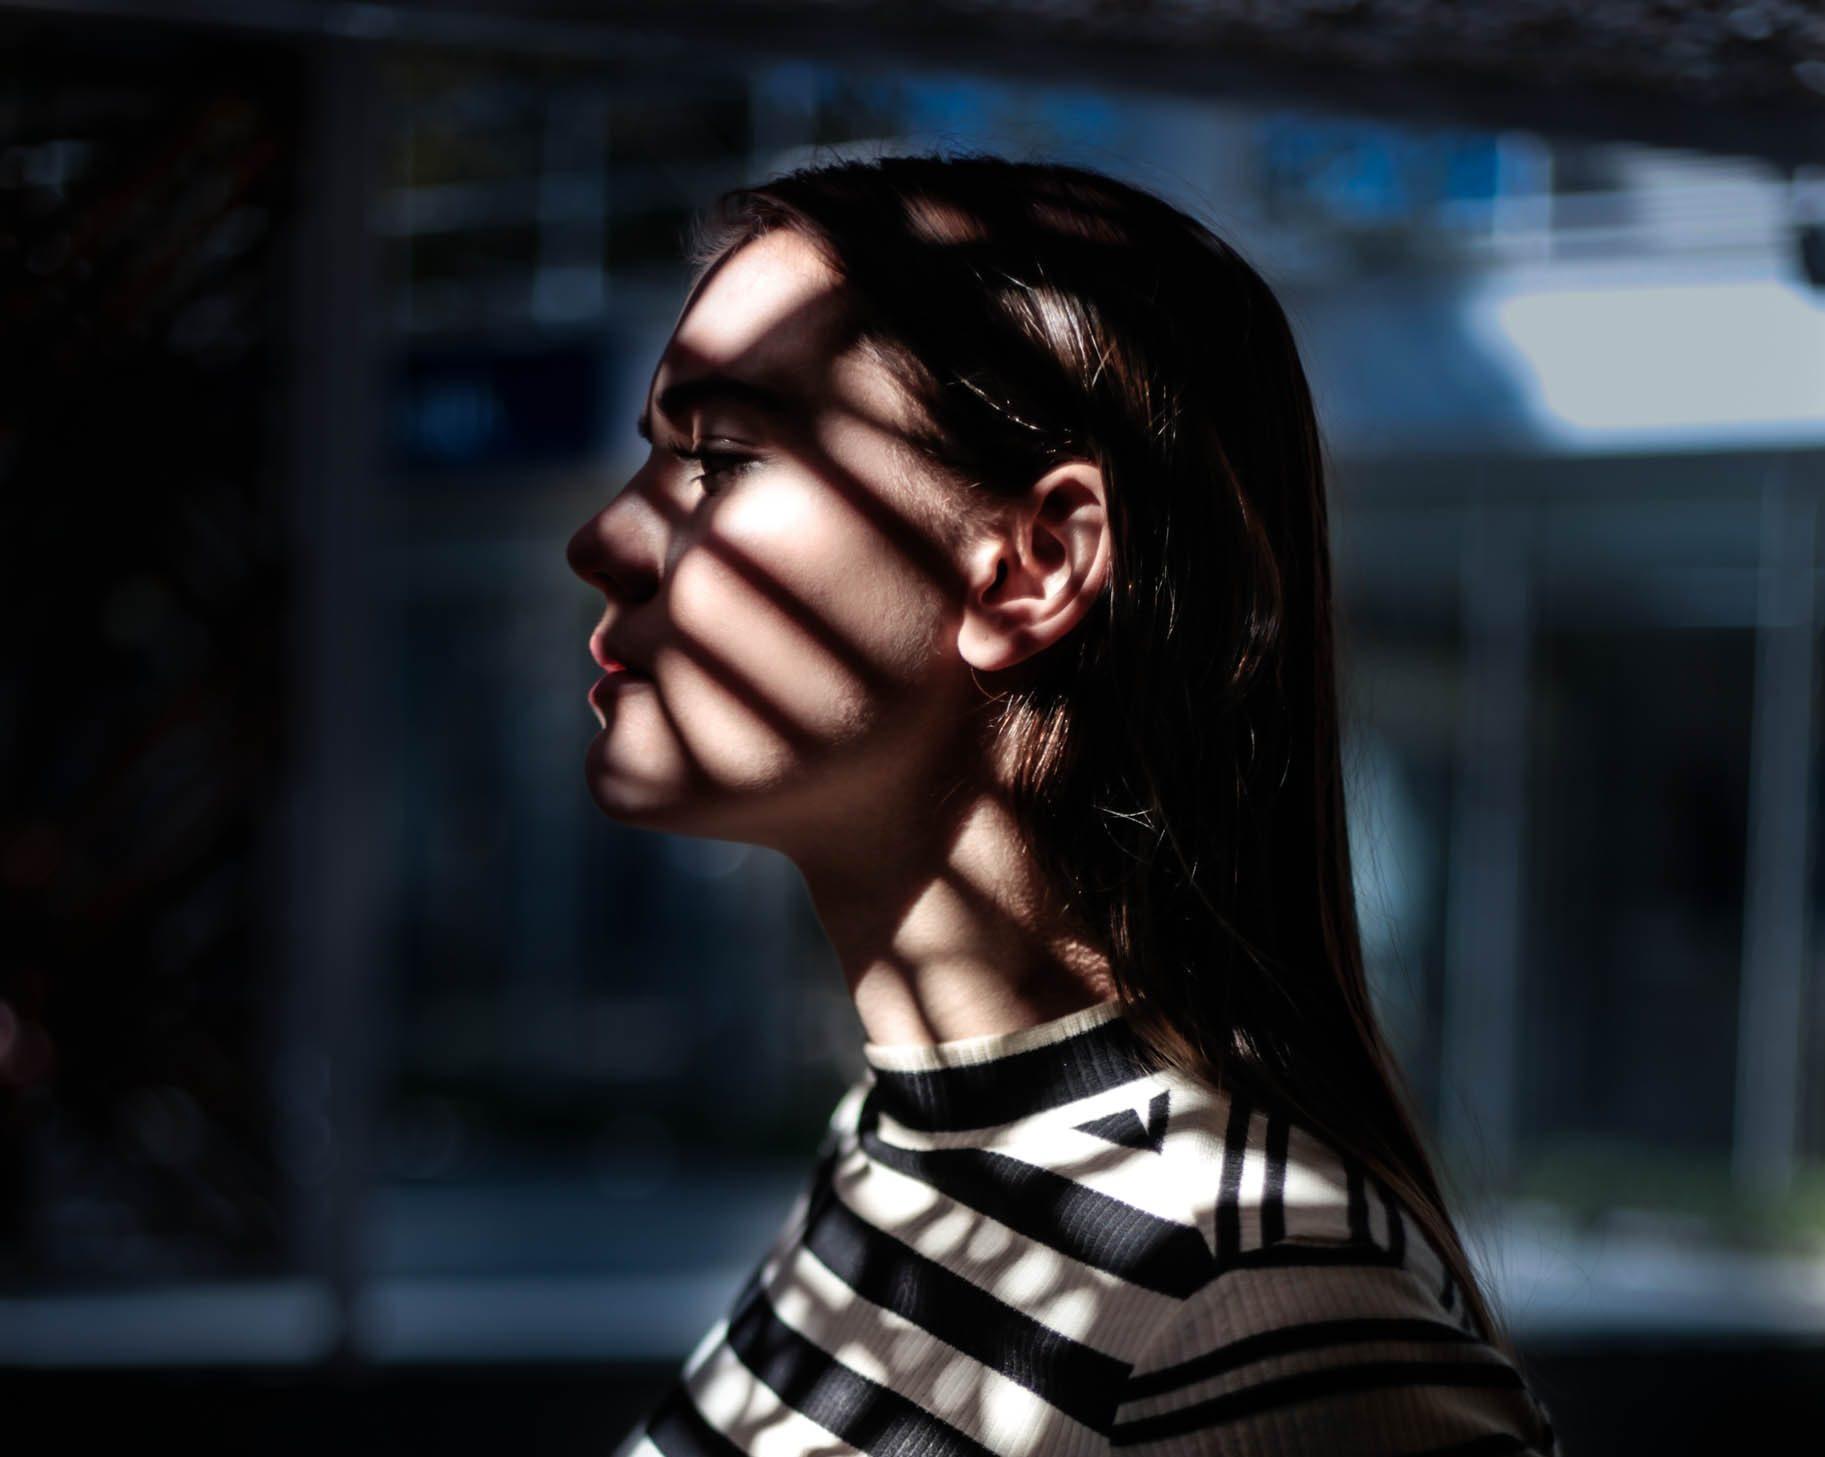 seksueel misbruik en eetstoornis